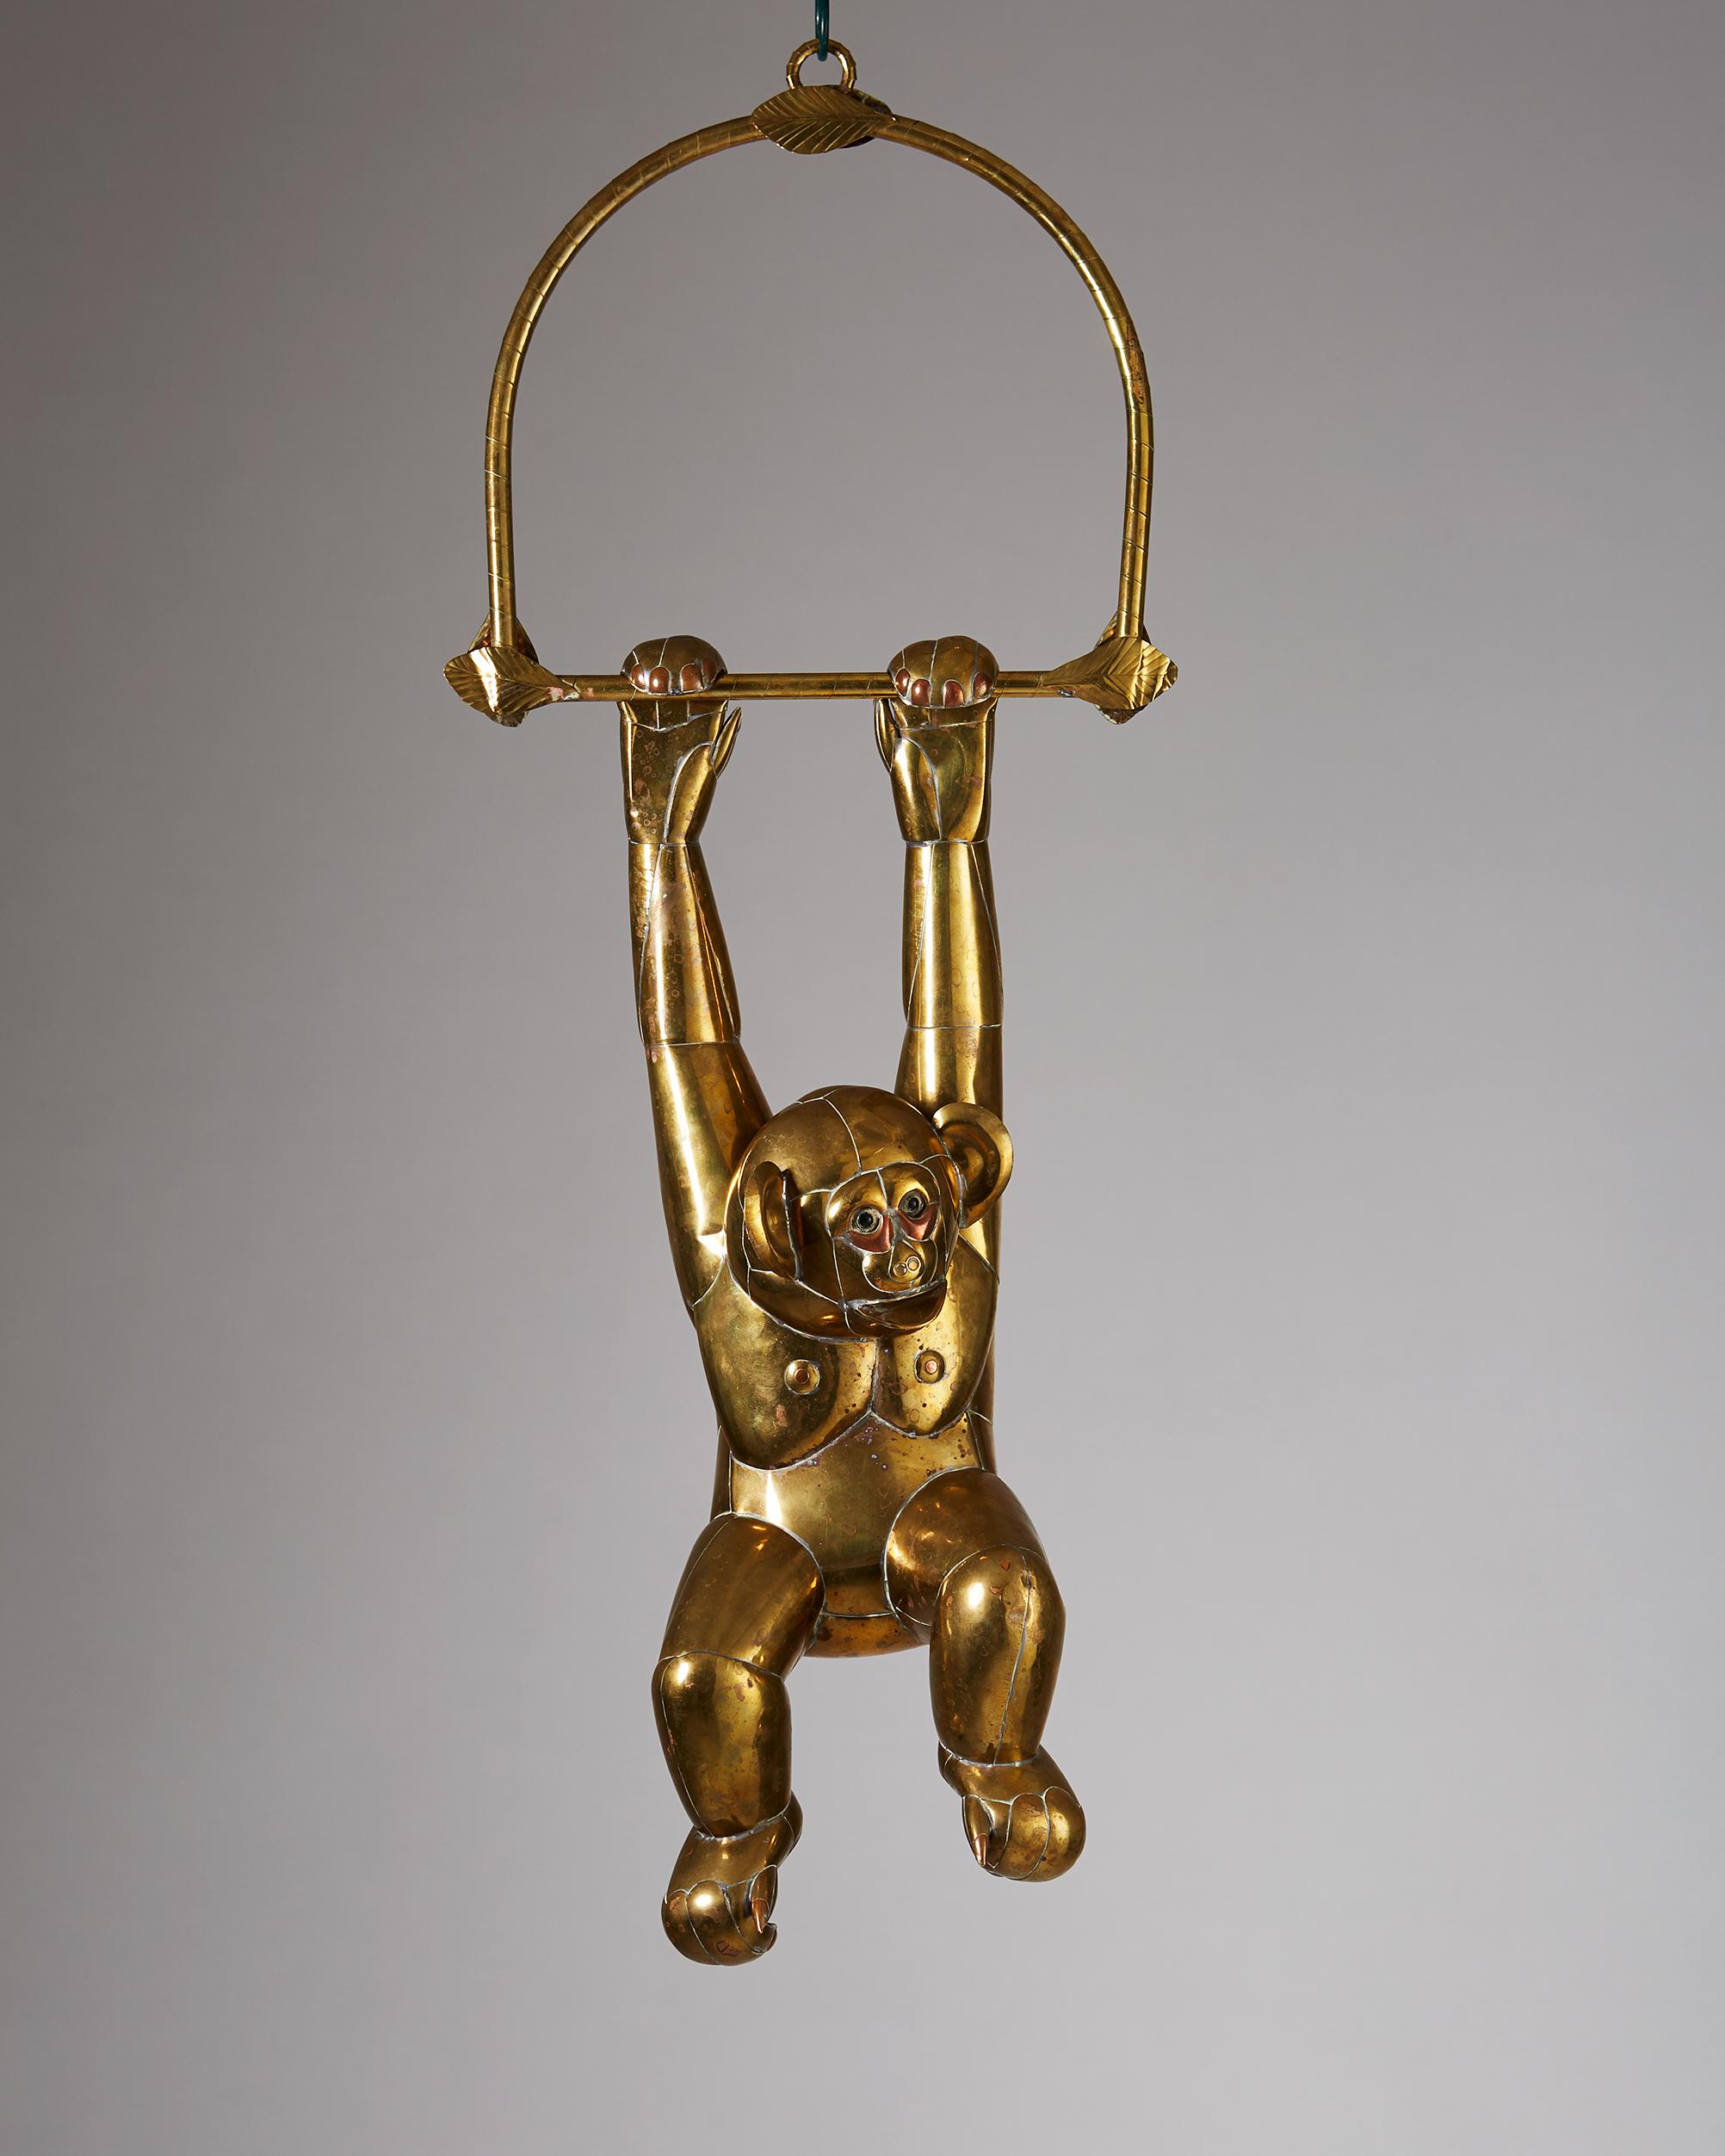 Sergio Bustamante  Monkey sculpture Mexico, 1970's Patinated brass. 83 cm